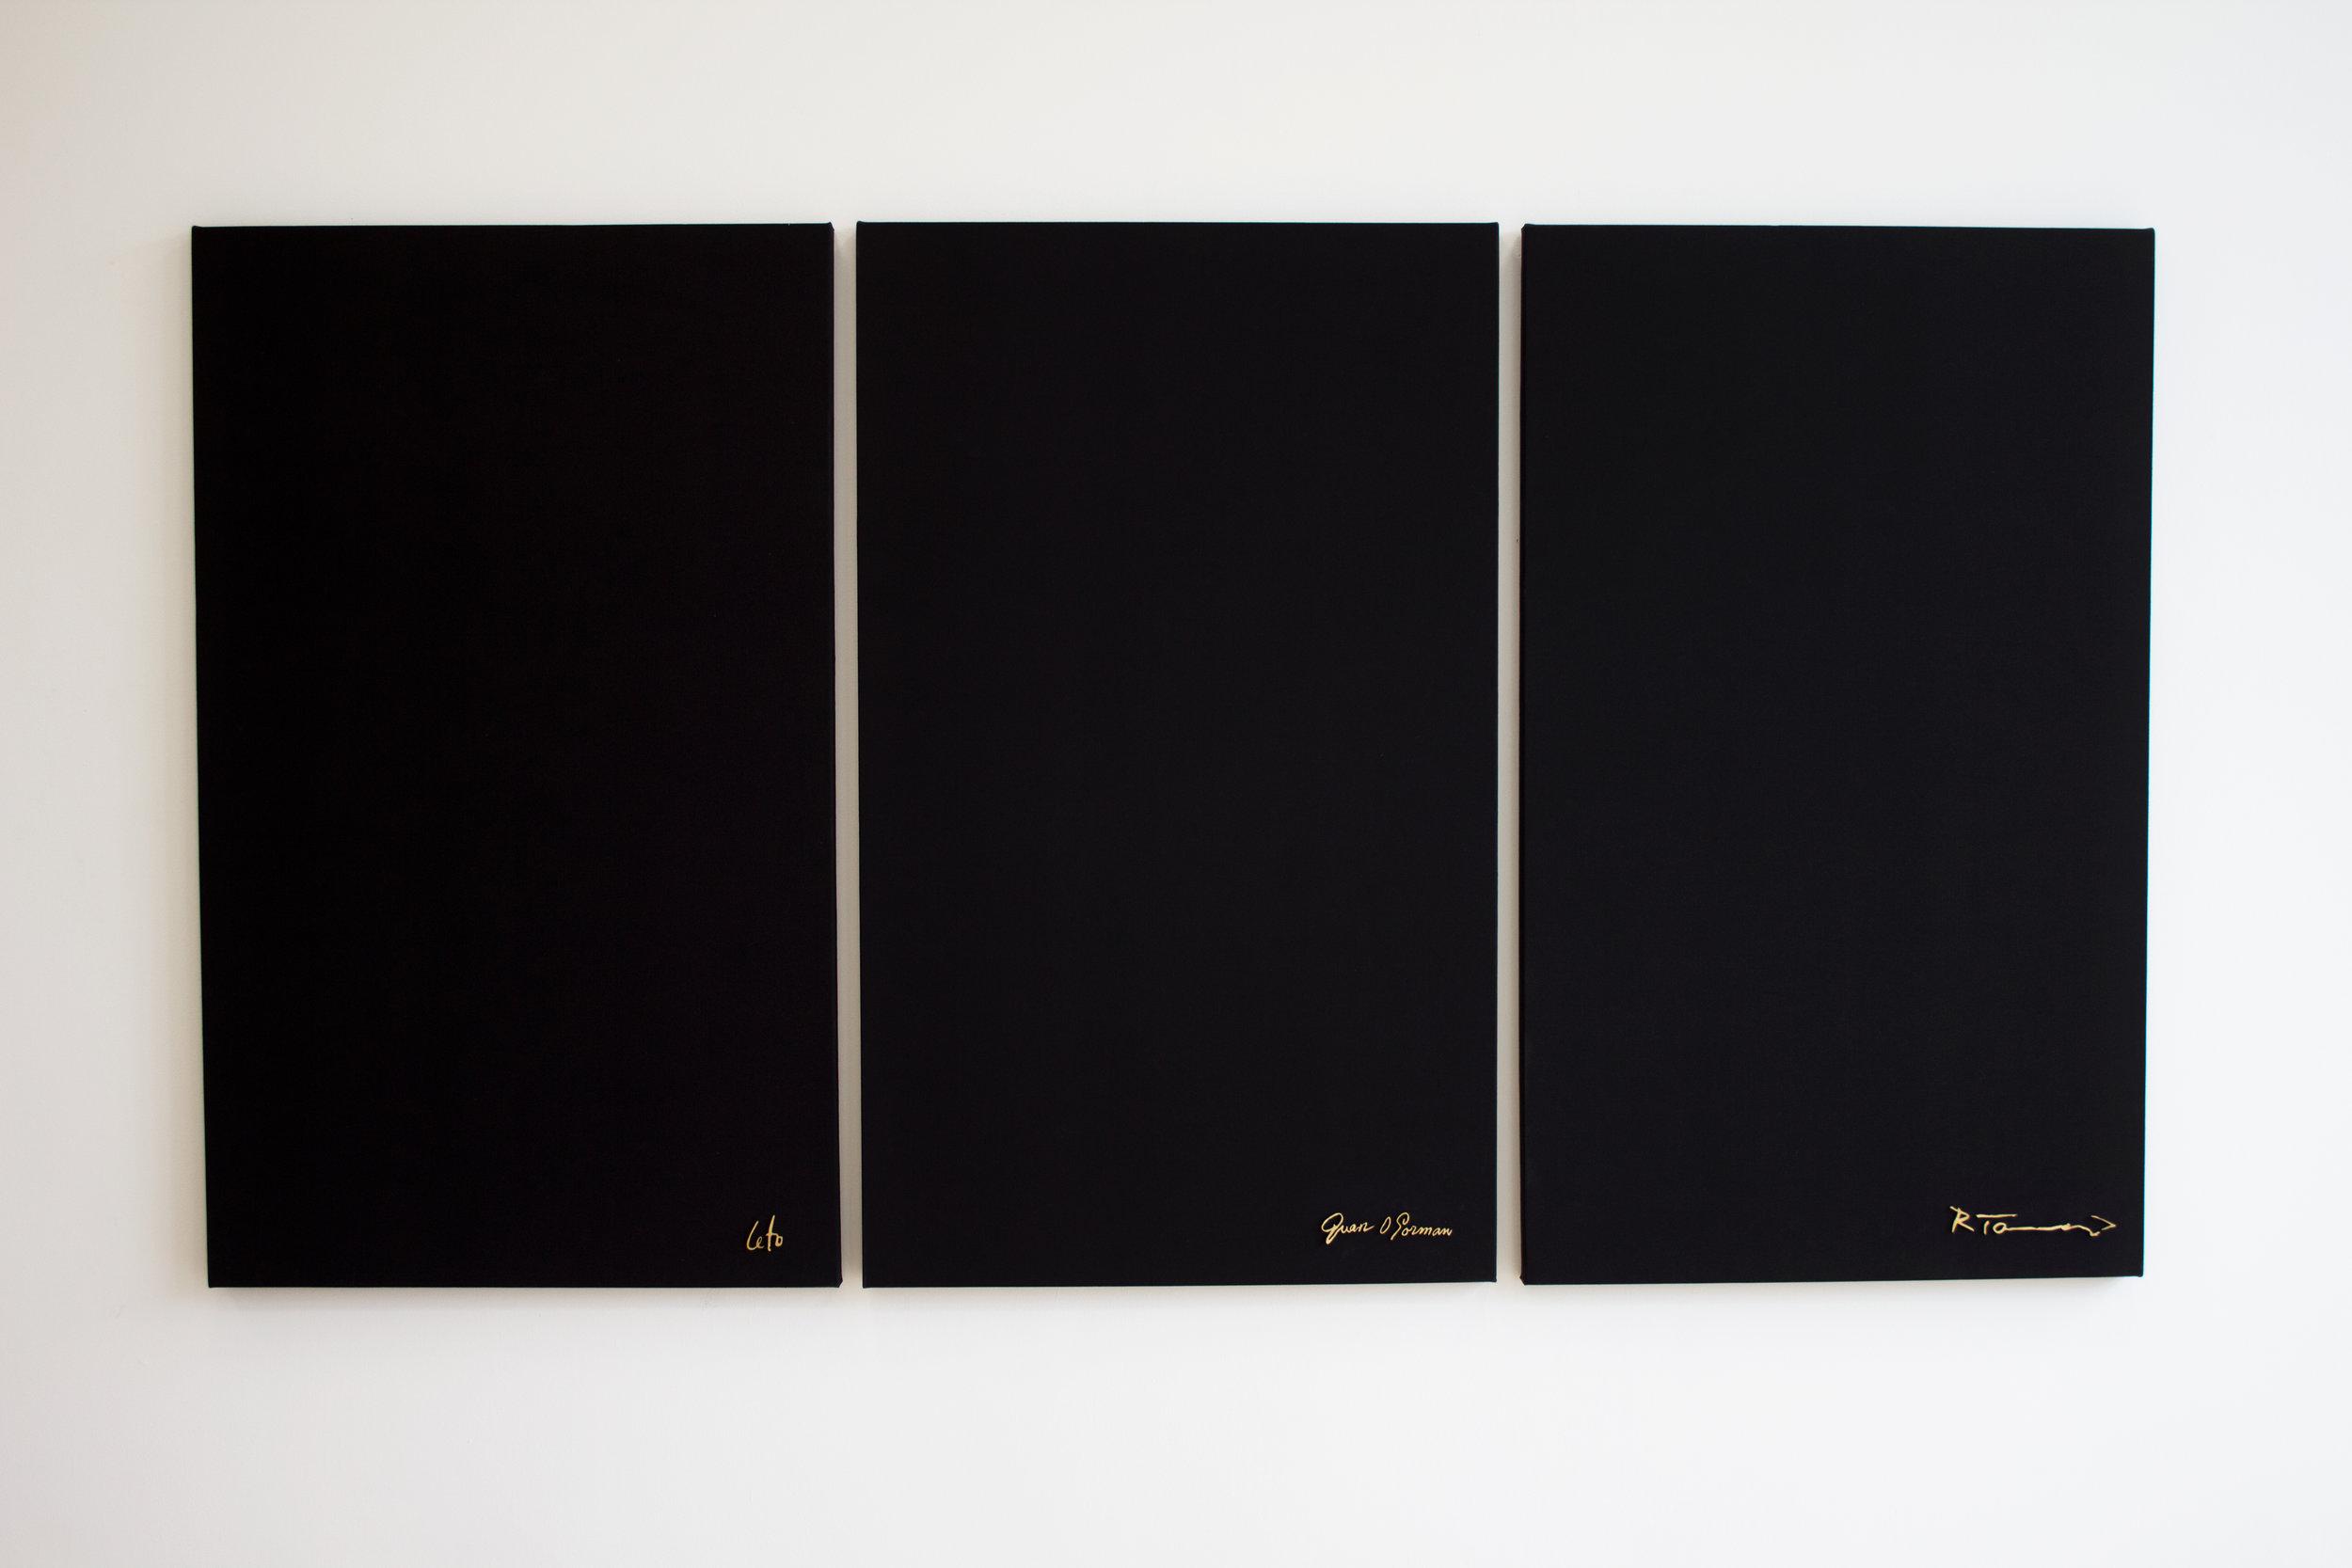 La Negación la Pintura Mexicana , 2017, canvas and bronze, triptych 60 x 36 inches per panel